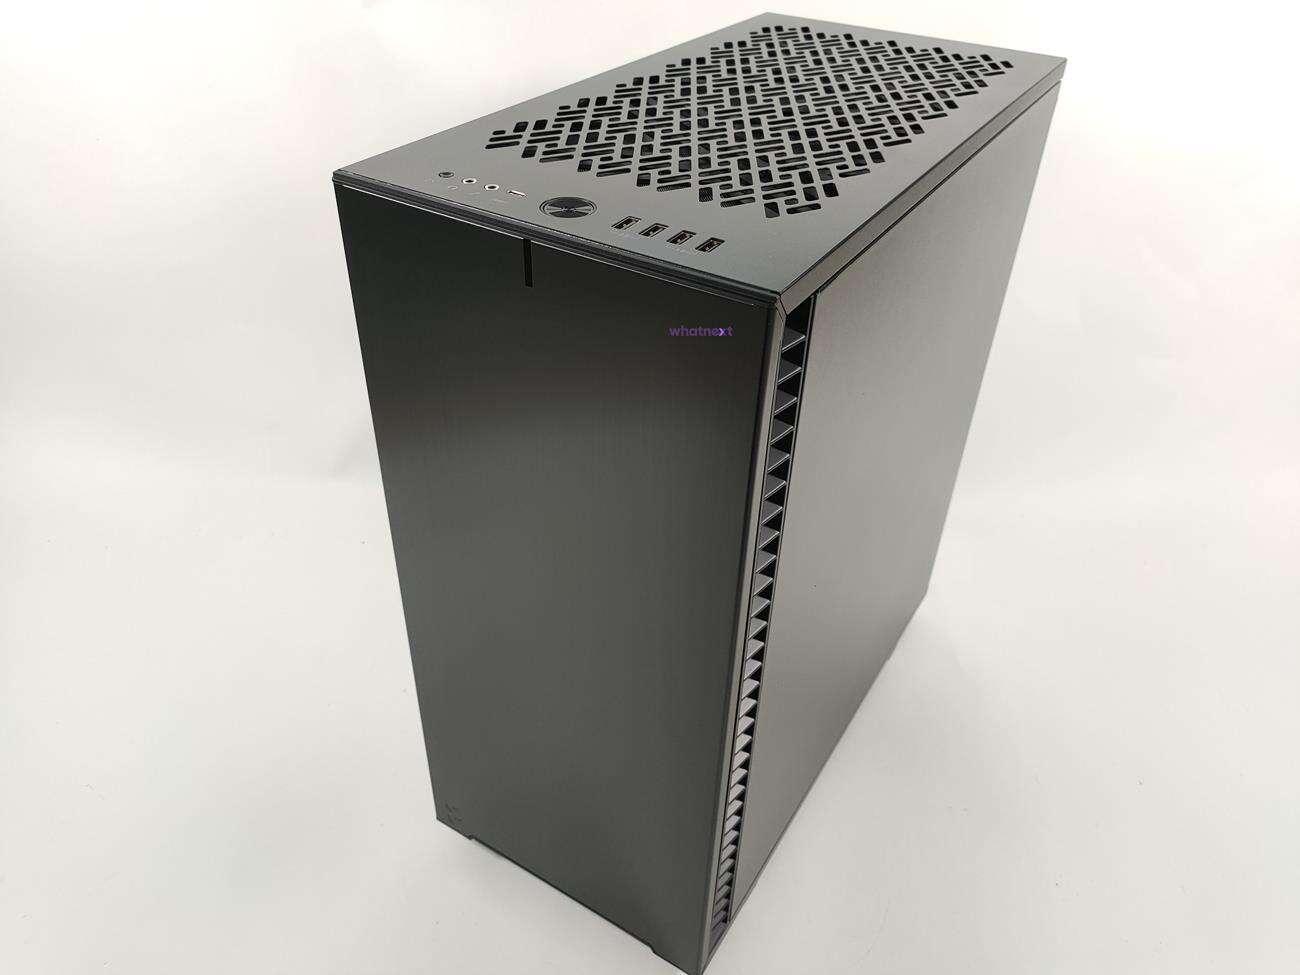 obudowa Fractal Design Define 7 Compact, AiO Celsius+ S28 Prisma, zasilacz ION+ 760P